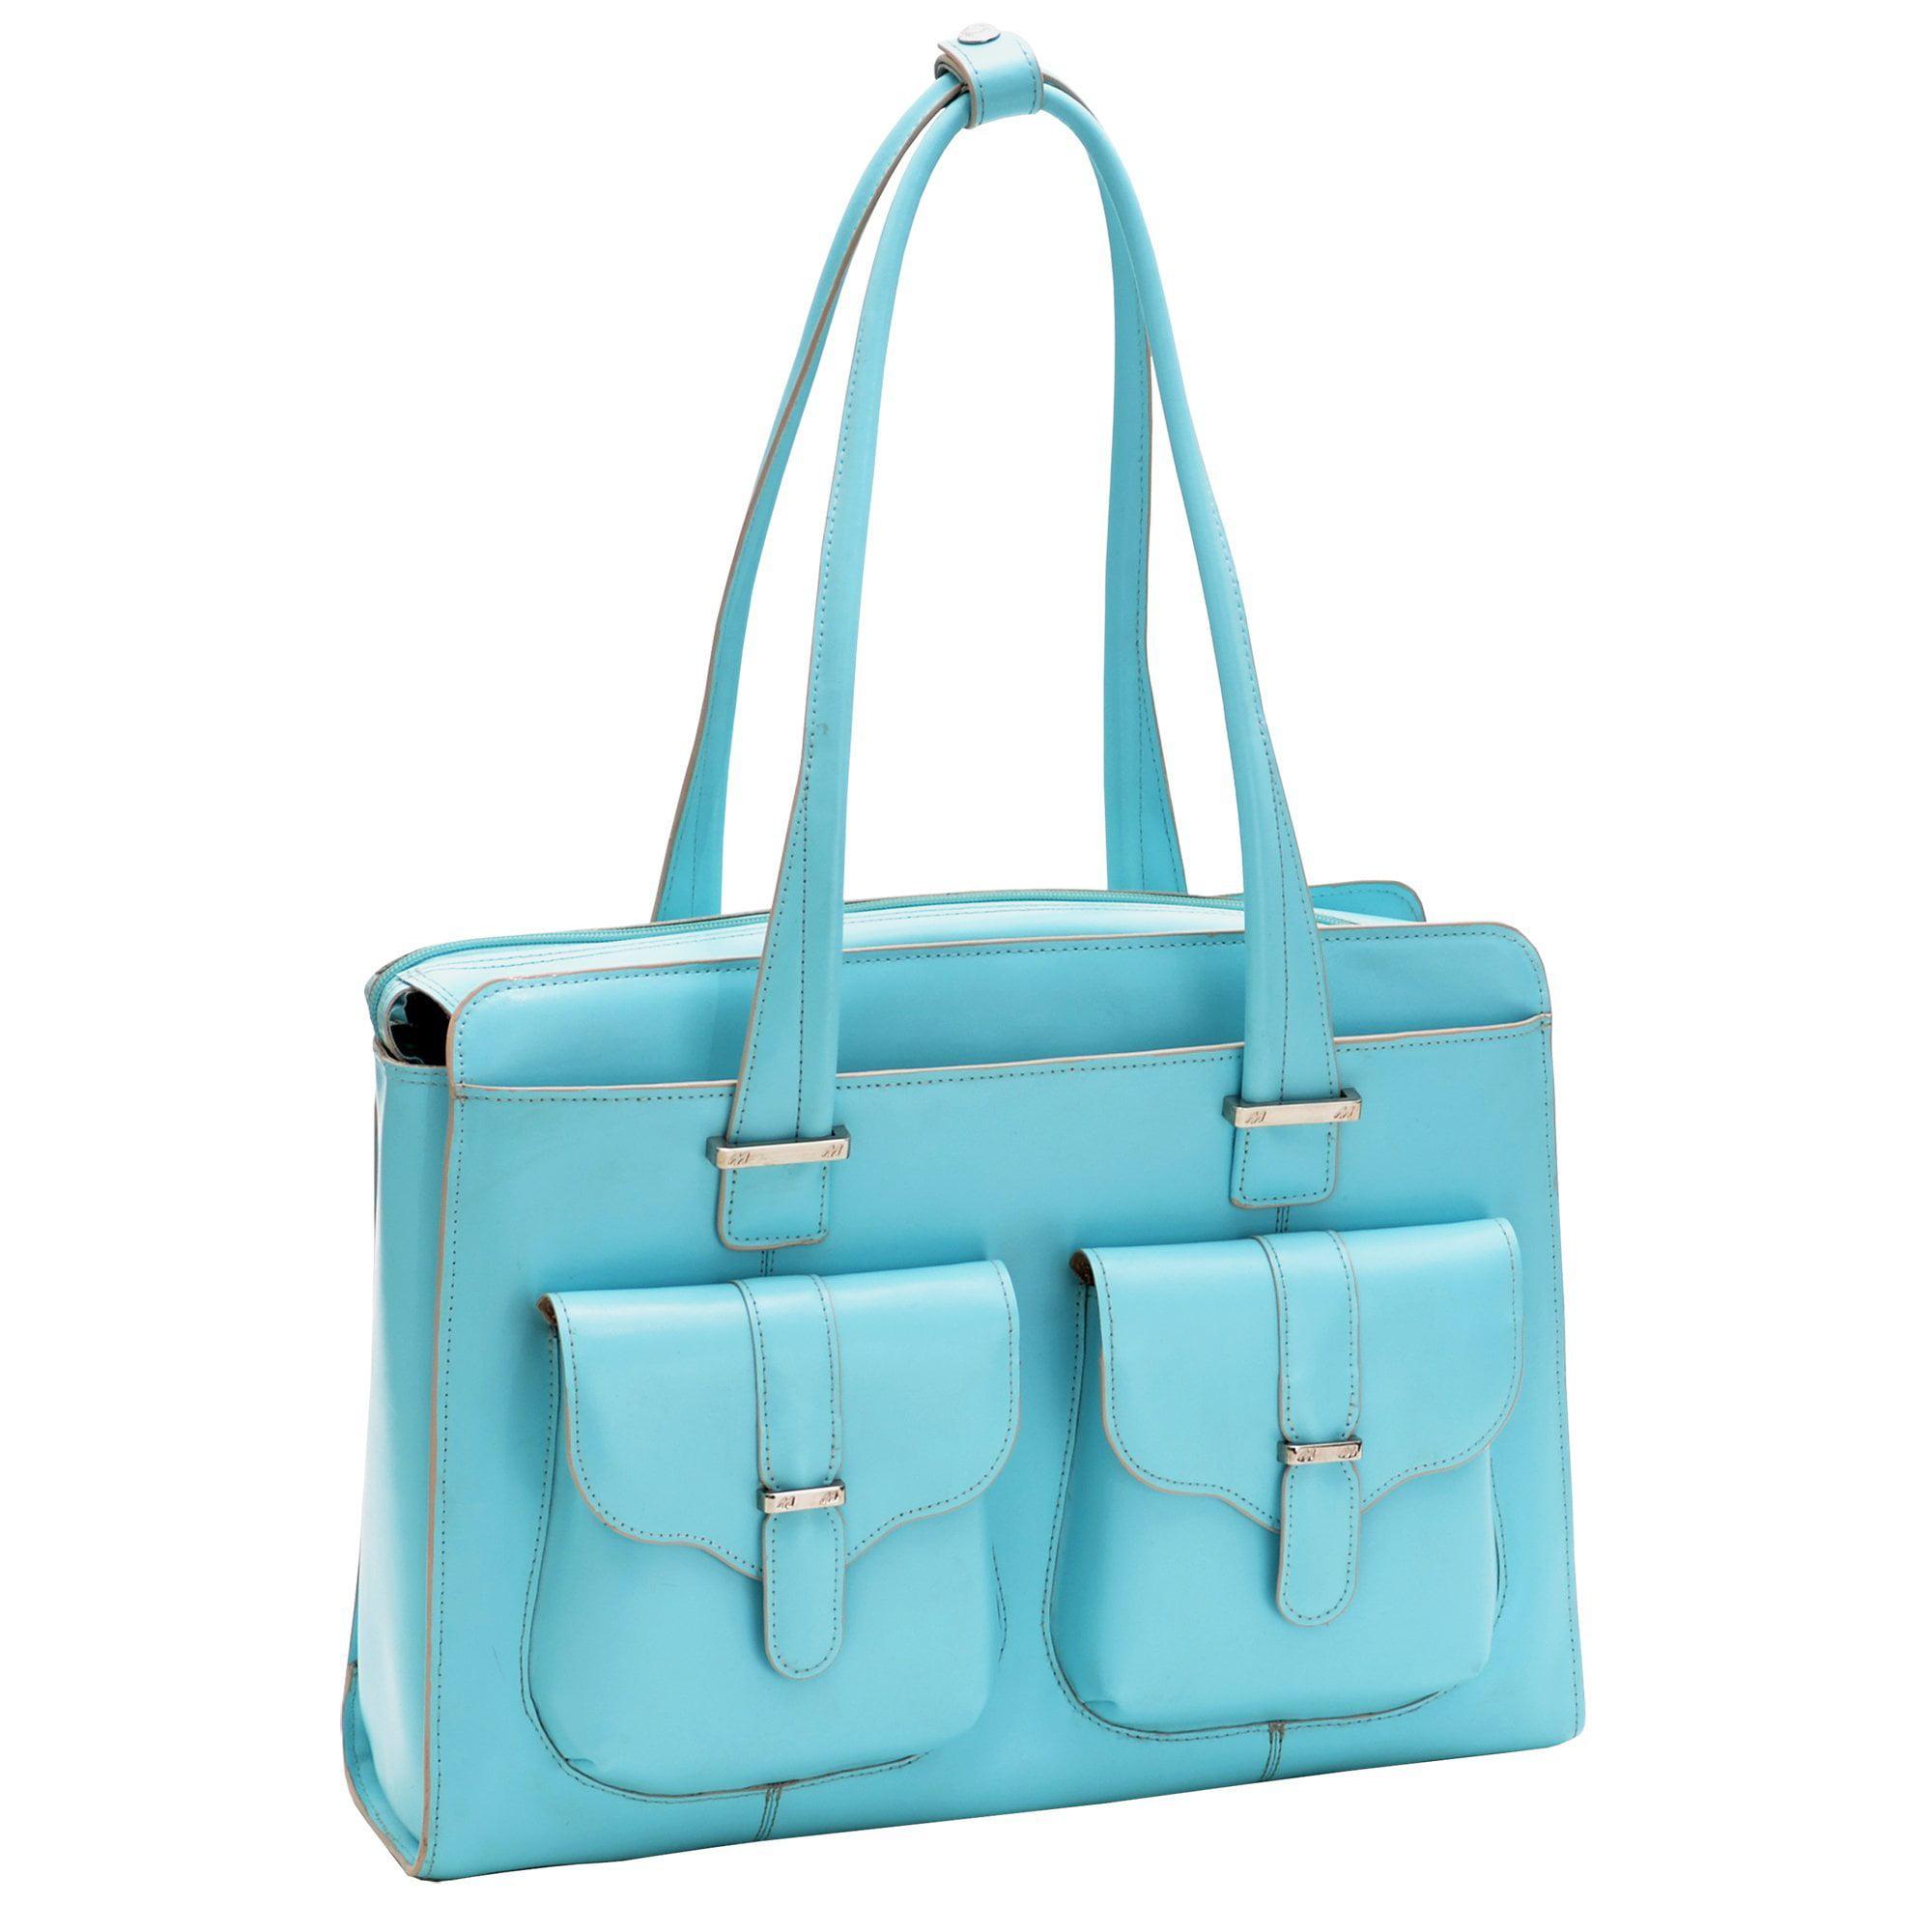 "Mckleinusa Alexis W Series 96548 Ladies' Briefcase - Briefcase - Shoulder Strap - 2 Pocket15.4"" Screen Support - Leather - Aqua Blue"